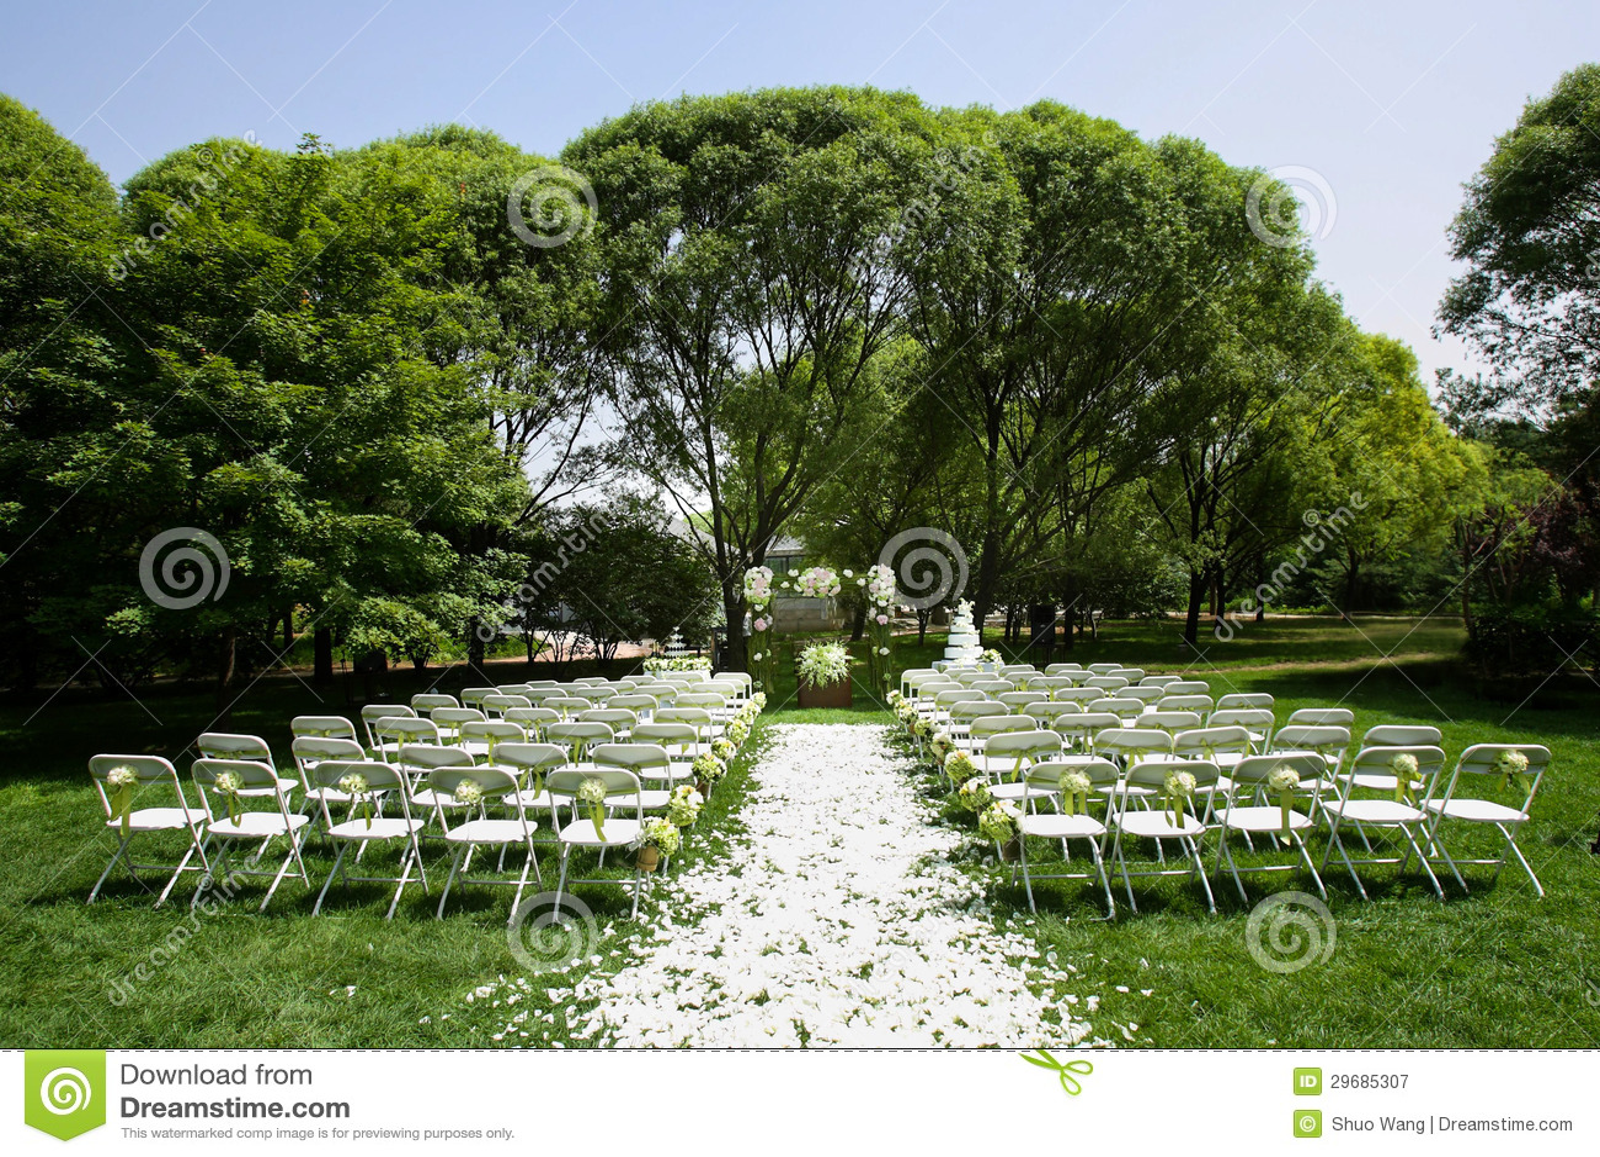 Outdoor wedding Scene stock image Image of engagement  29685307